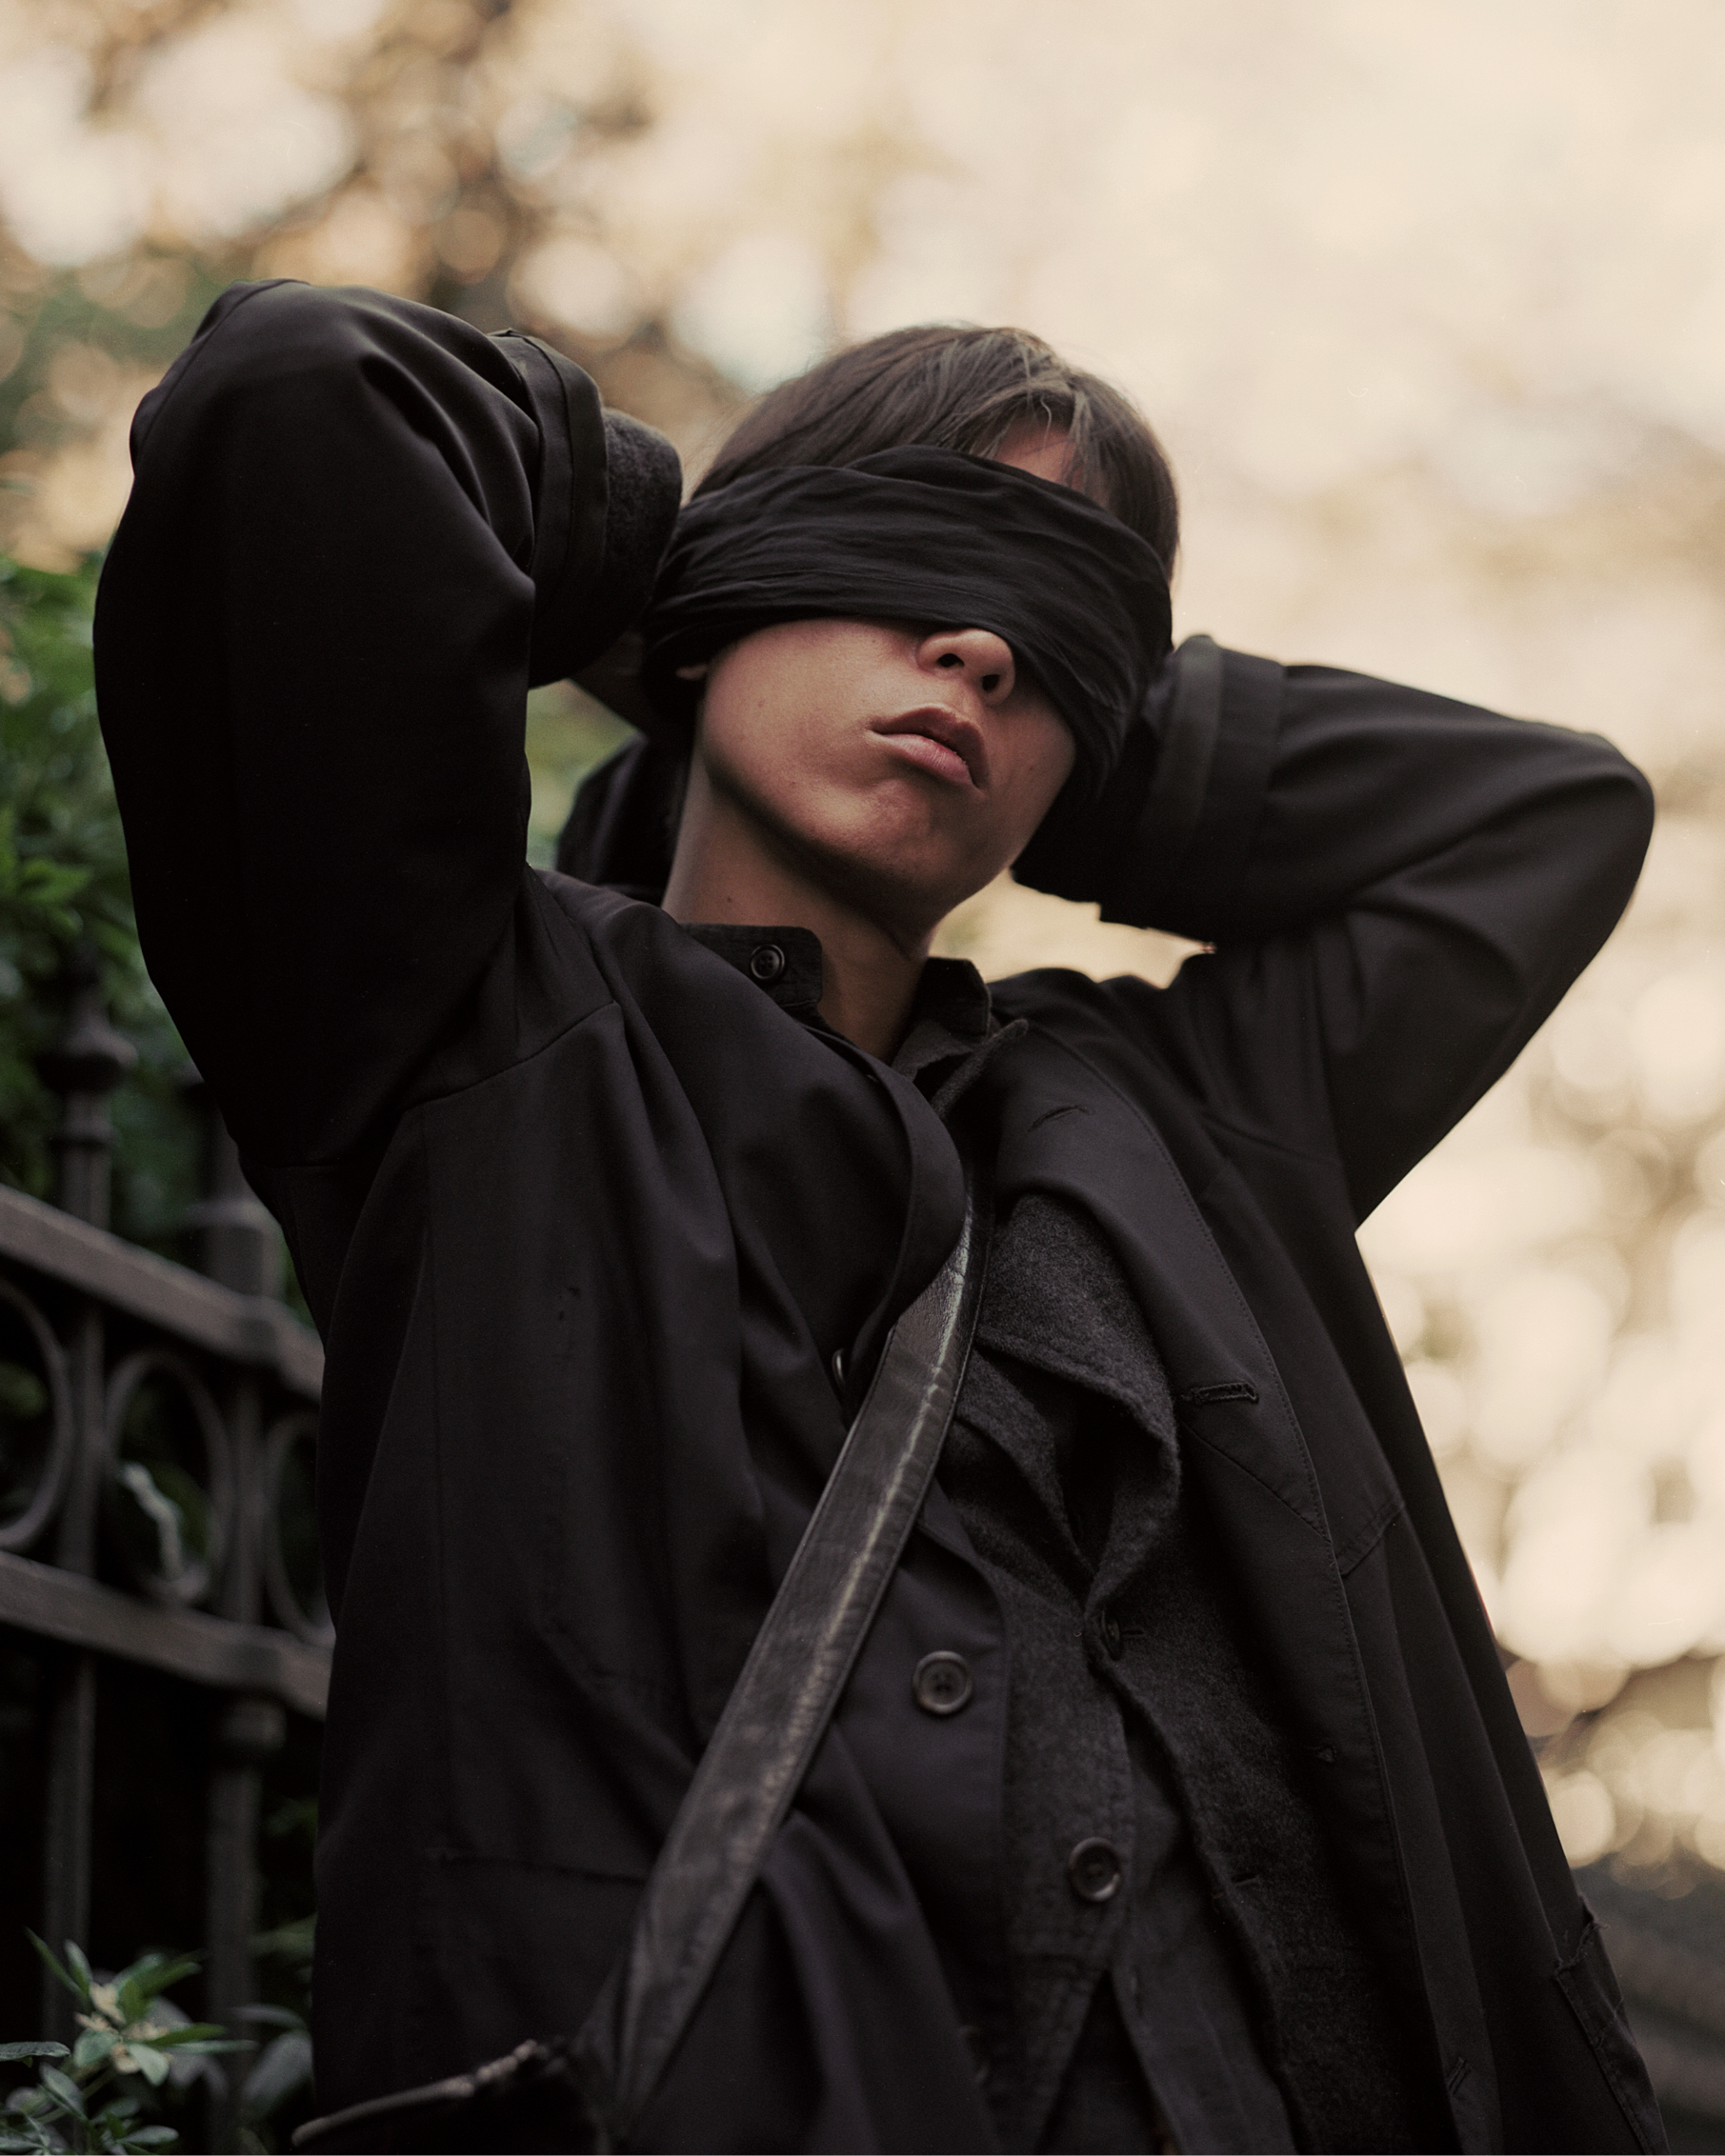 tb-fieulaine-Gwak-Yohji-Paris4.jpg